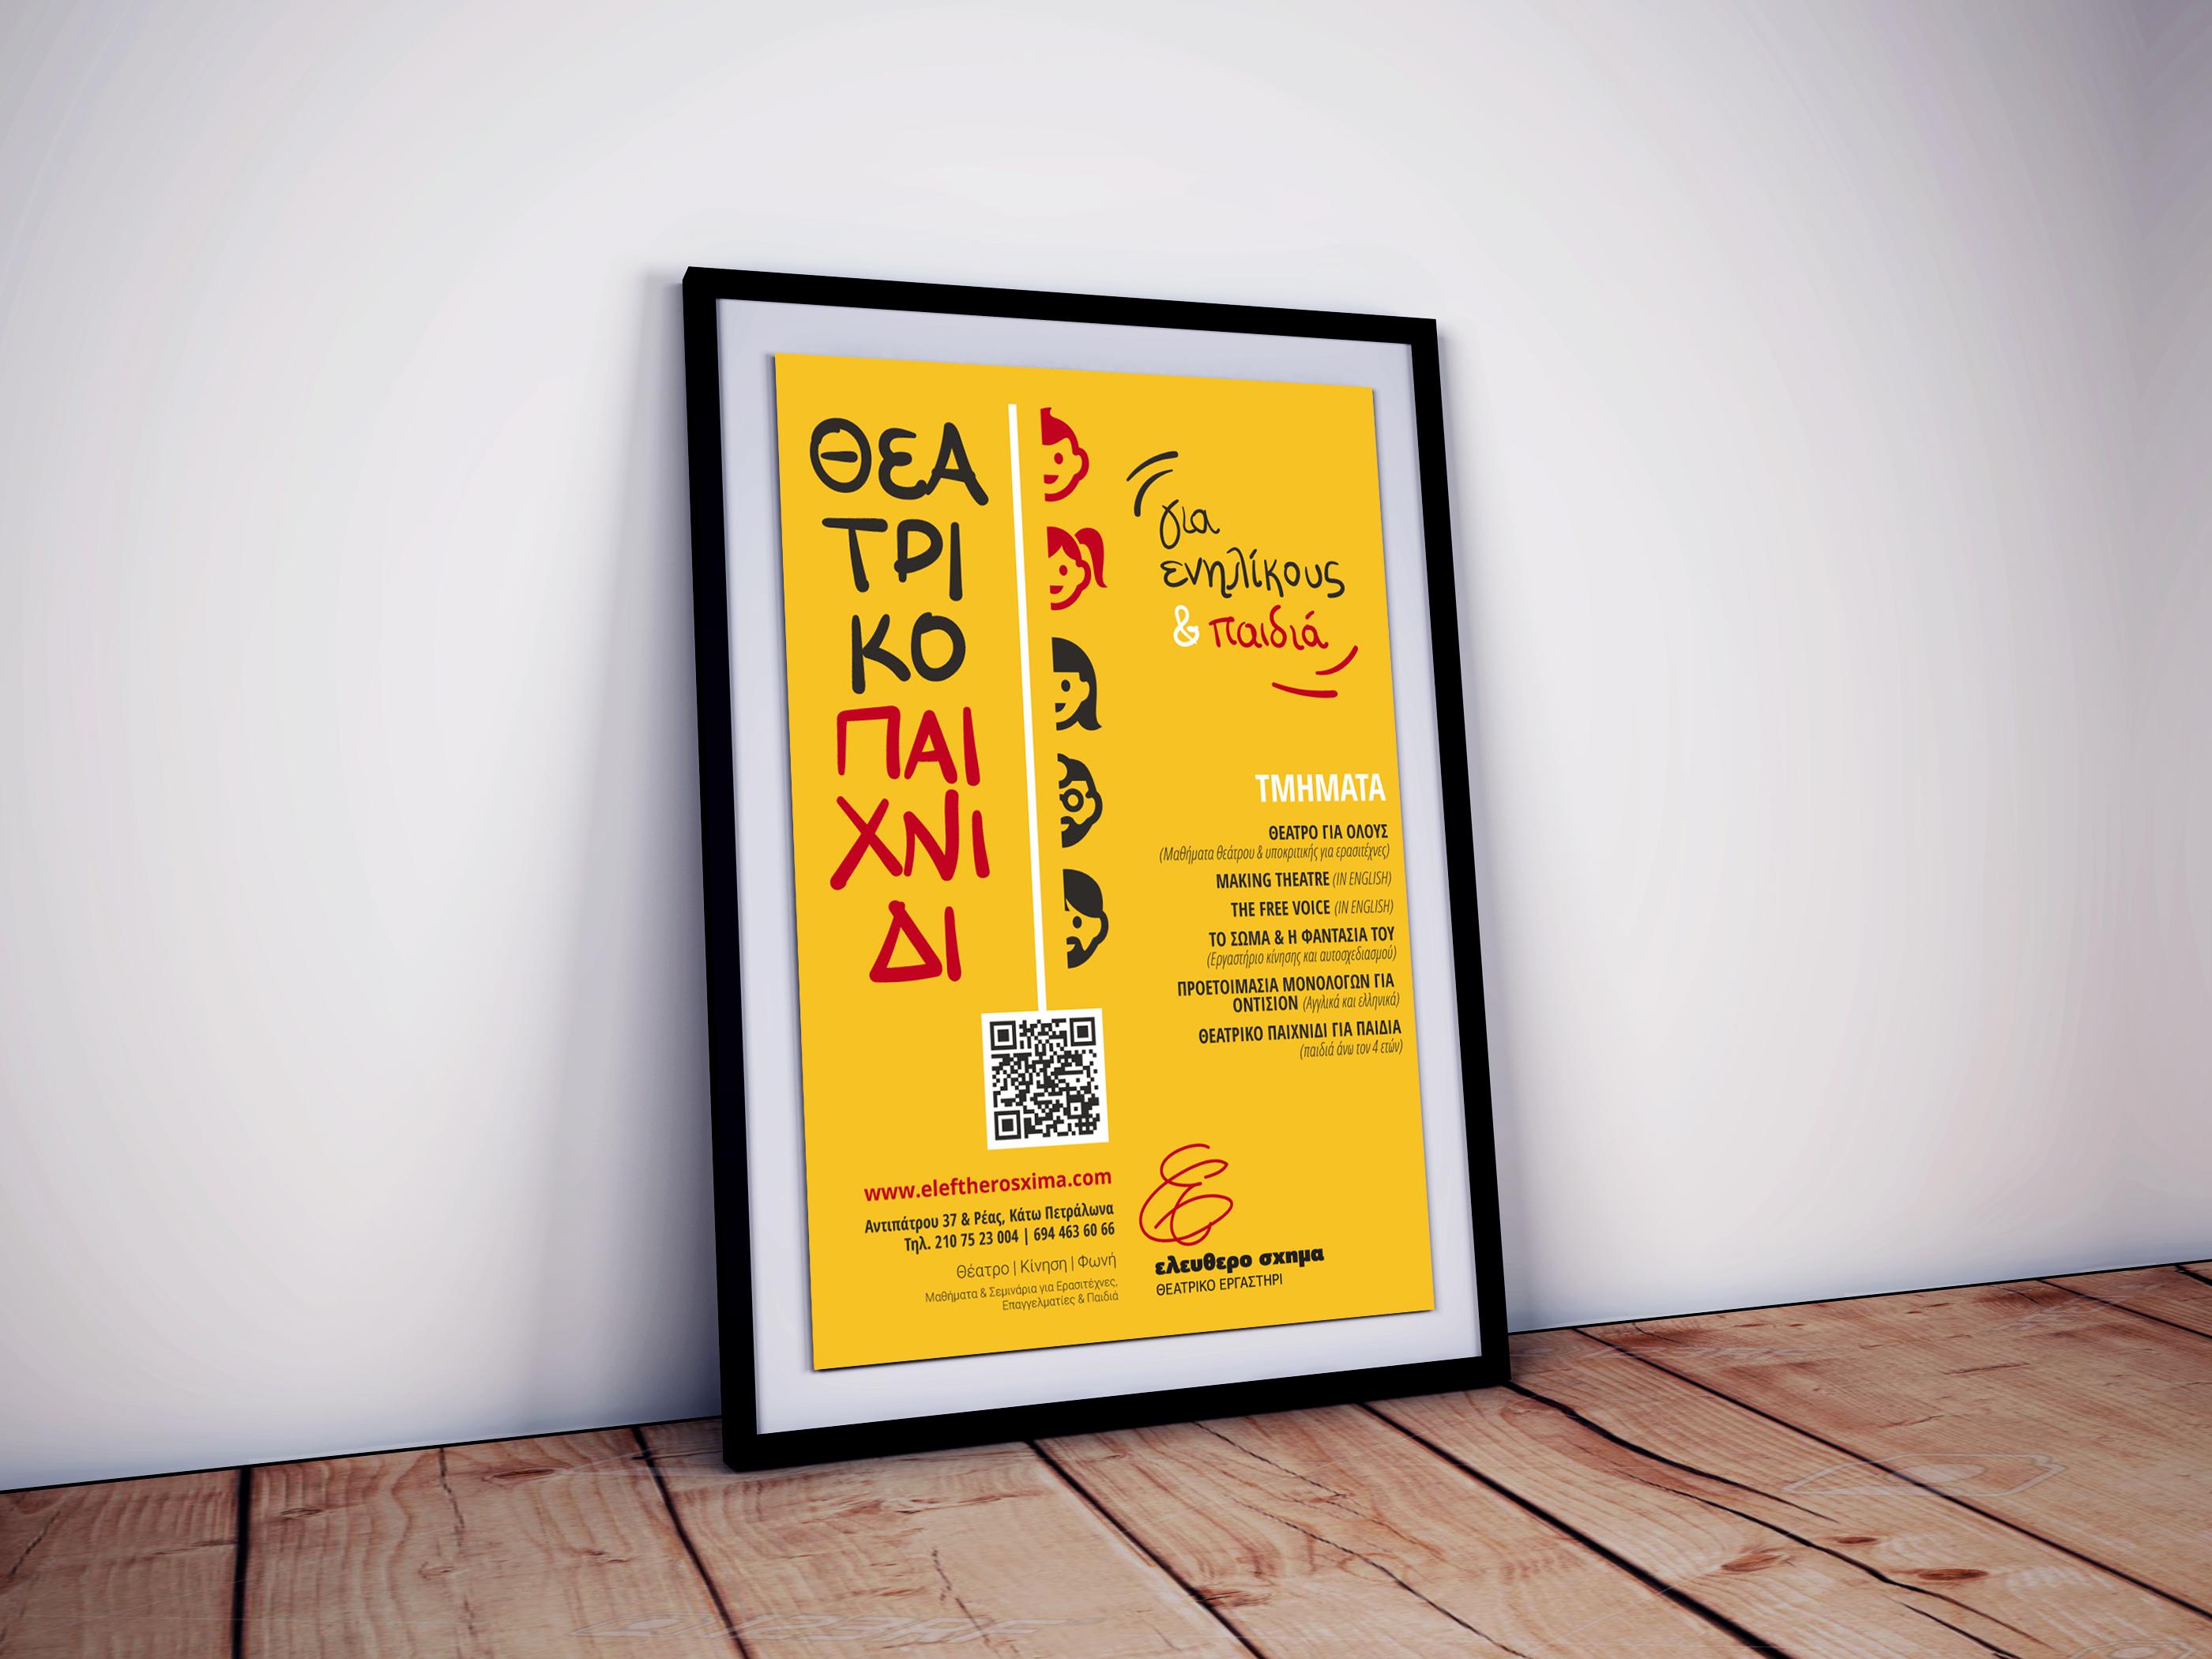 Poster - Acting studio in Athens, www.eleftherosxima.com #θέατρογιαερασιτέχνες #ερασιτεχνικόθέατρο #μαθήματαυποκριτικής #θέατρογιαόλους, #μαθήματαθεάτρου #αυτοσχεδιασμός #actingstudio #actinglessons #theatreforamateurs #theaterforamateurs #θεατρικόπαιχνίδιγιαενήλικες #θεατρικόπαιχνίδιγιαπαιδιά #θέατρογιαπαιδιά #σεμινάριαυποκριτικής #ελεύθεροσχήμα #εργαστήριυποκριτικής